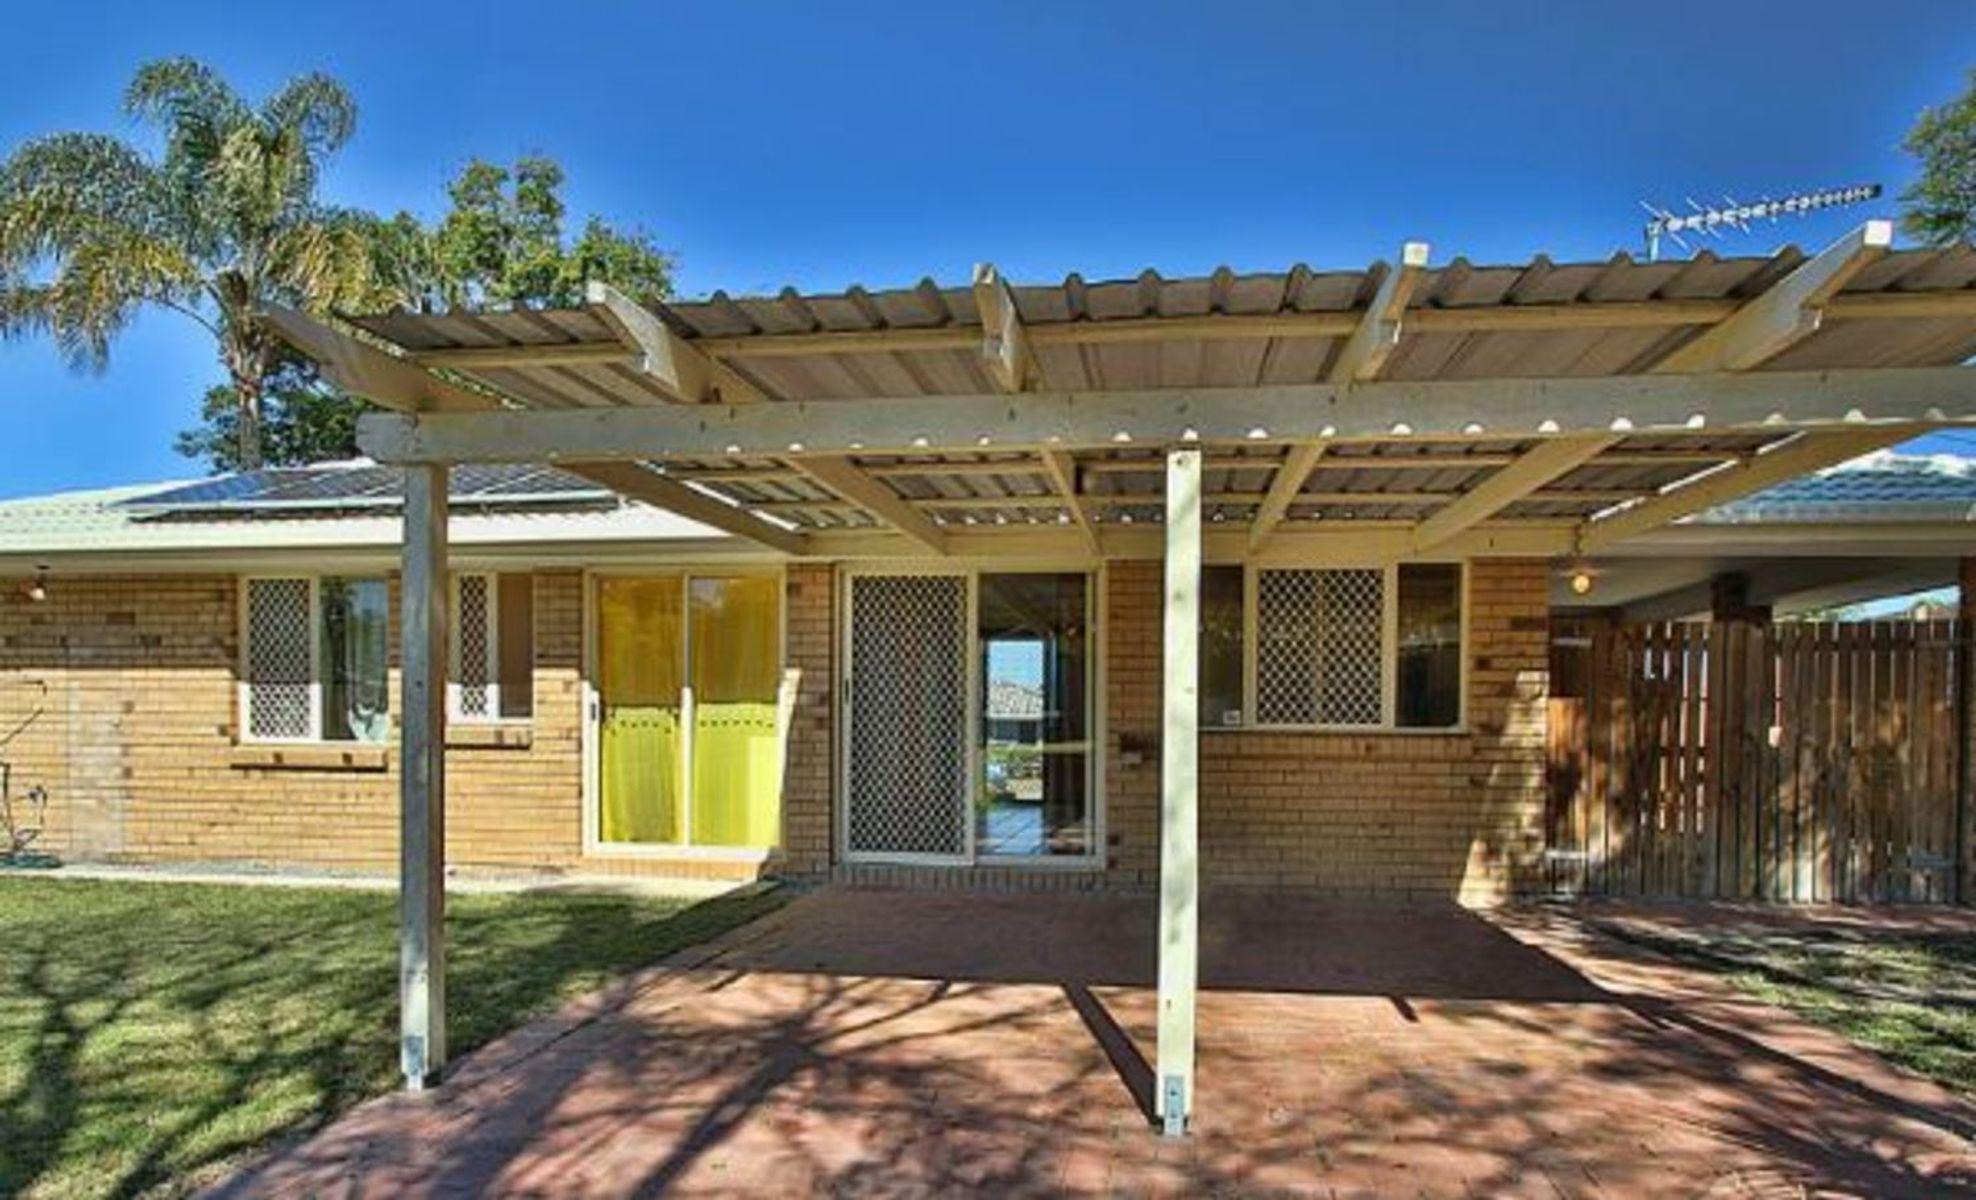 5 Grandview Rd, Crestmead, QLD 4132